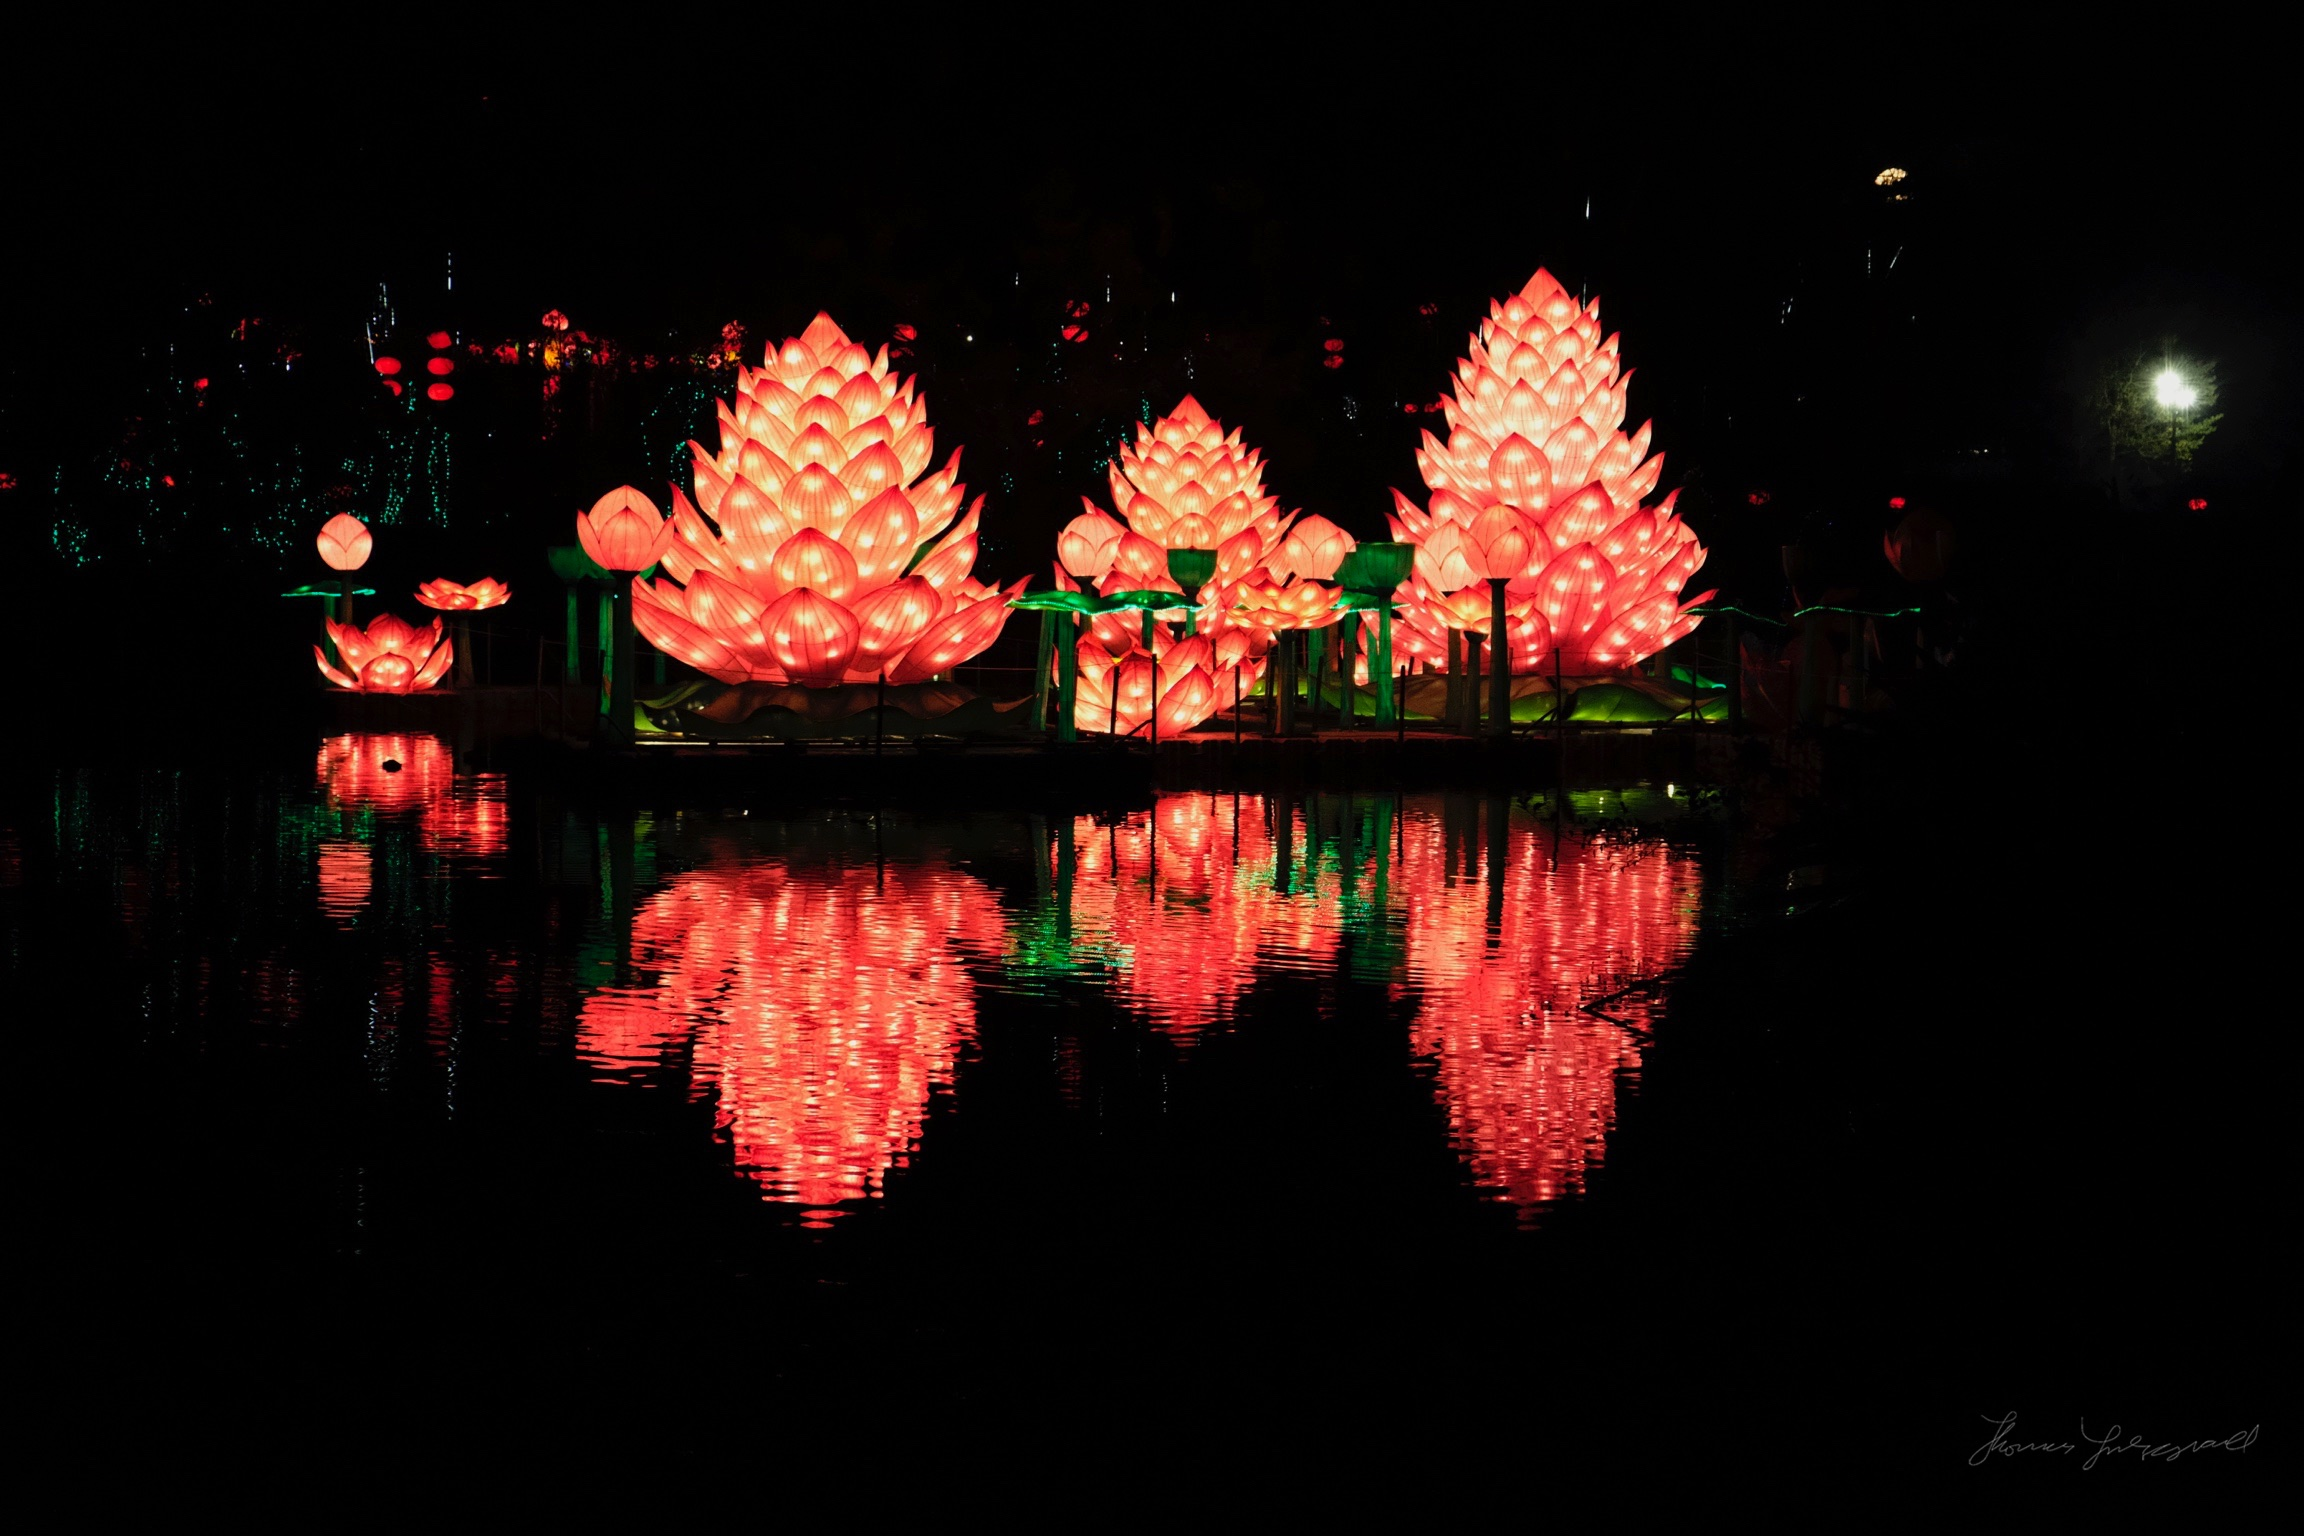 Wild-Lights-Dublin-Zoo-009.jpg